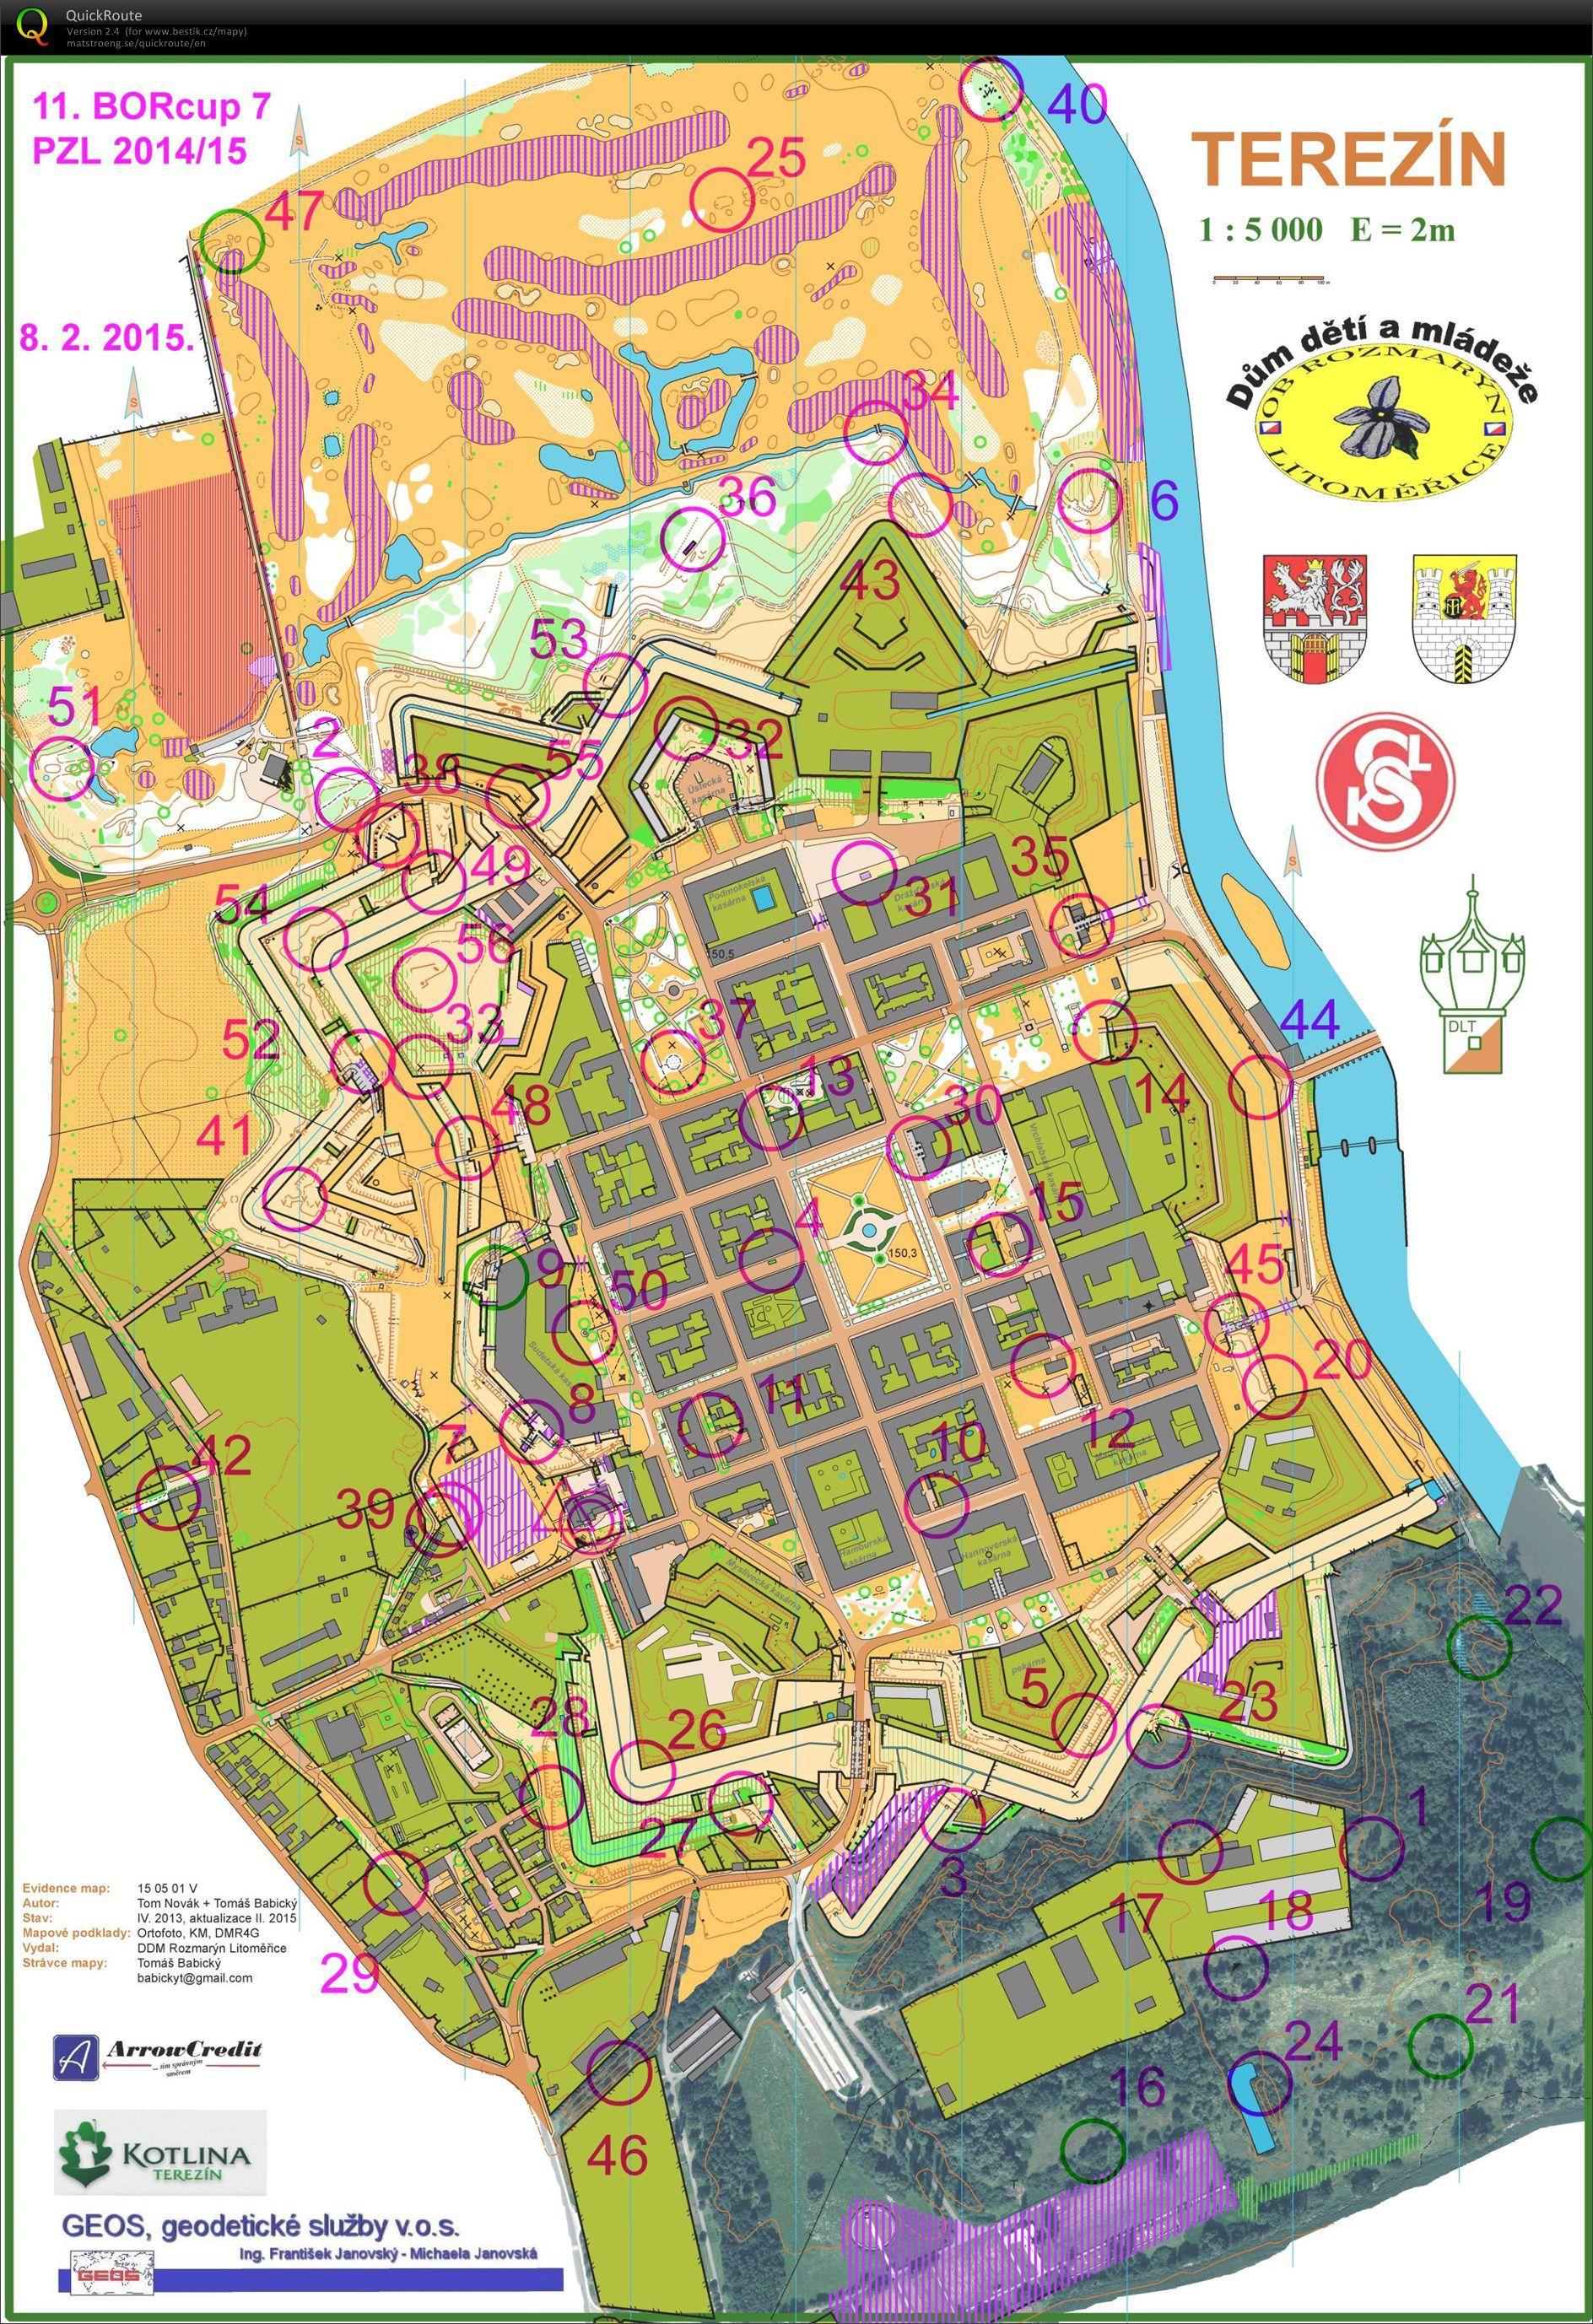 Borcup 7 Terezin Sprint February 8th 2015 Orienteering Map